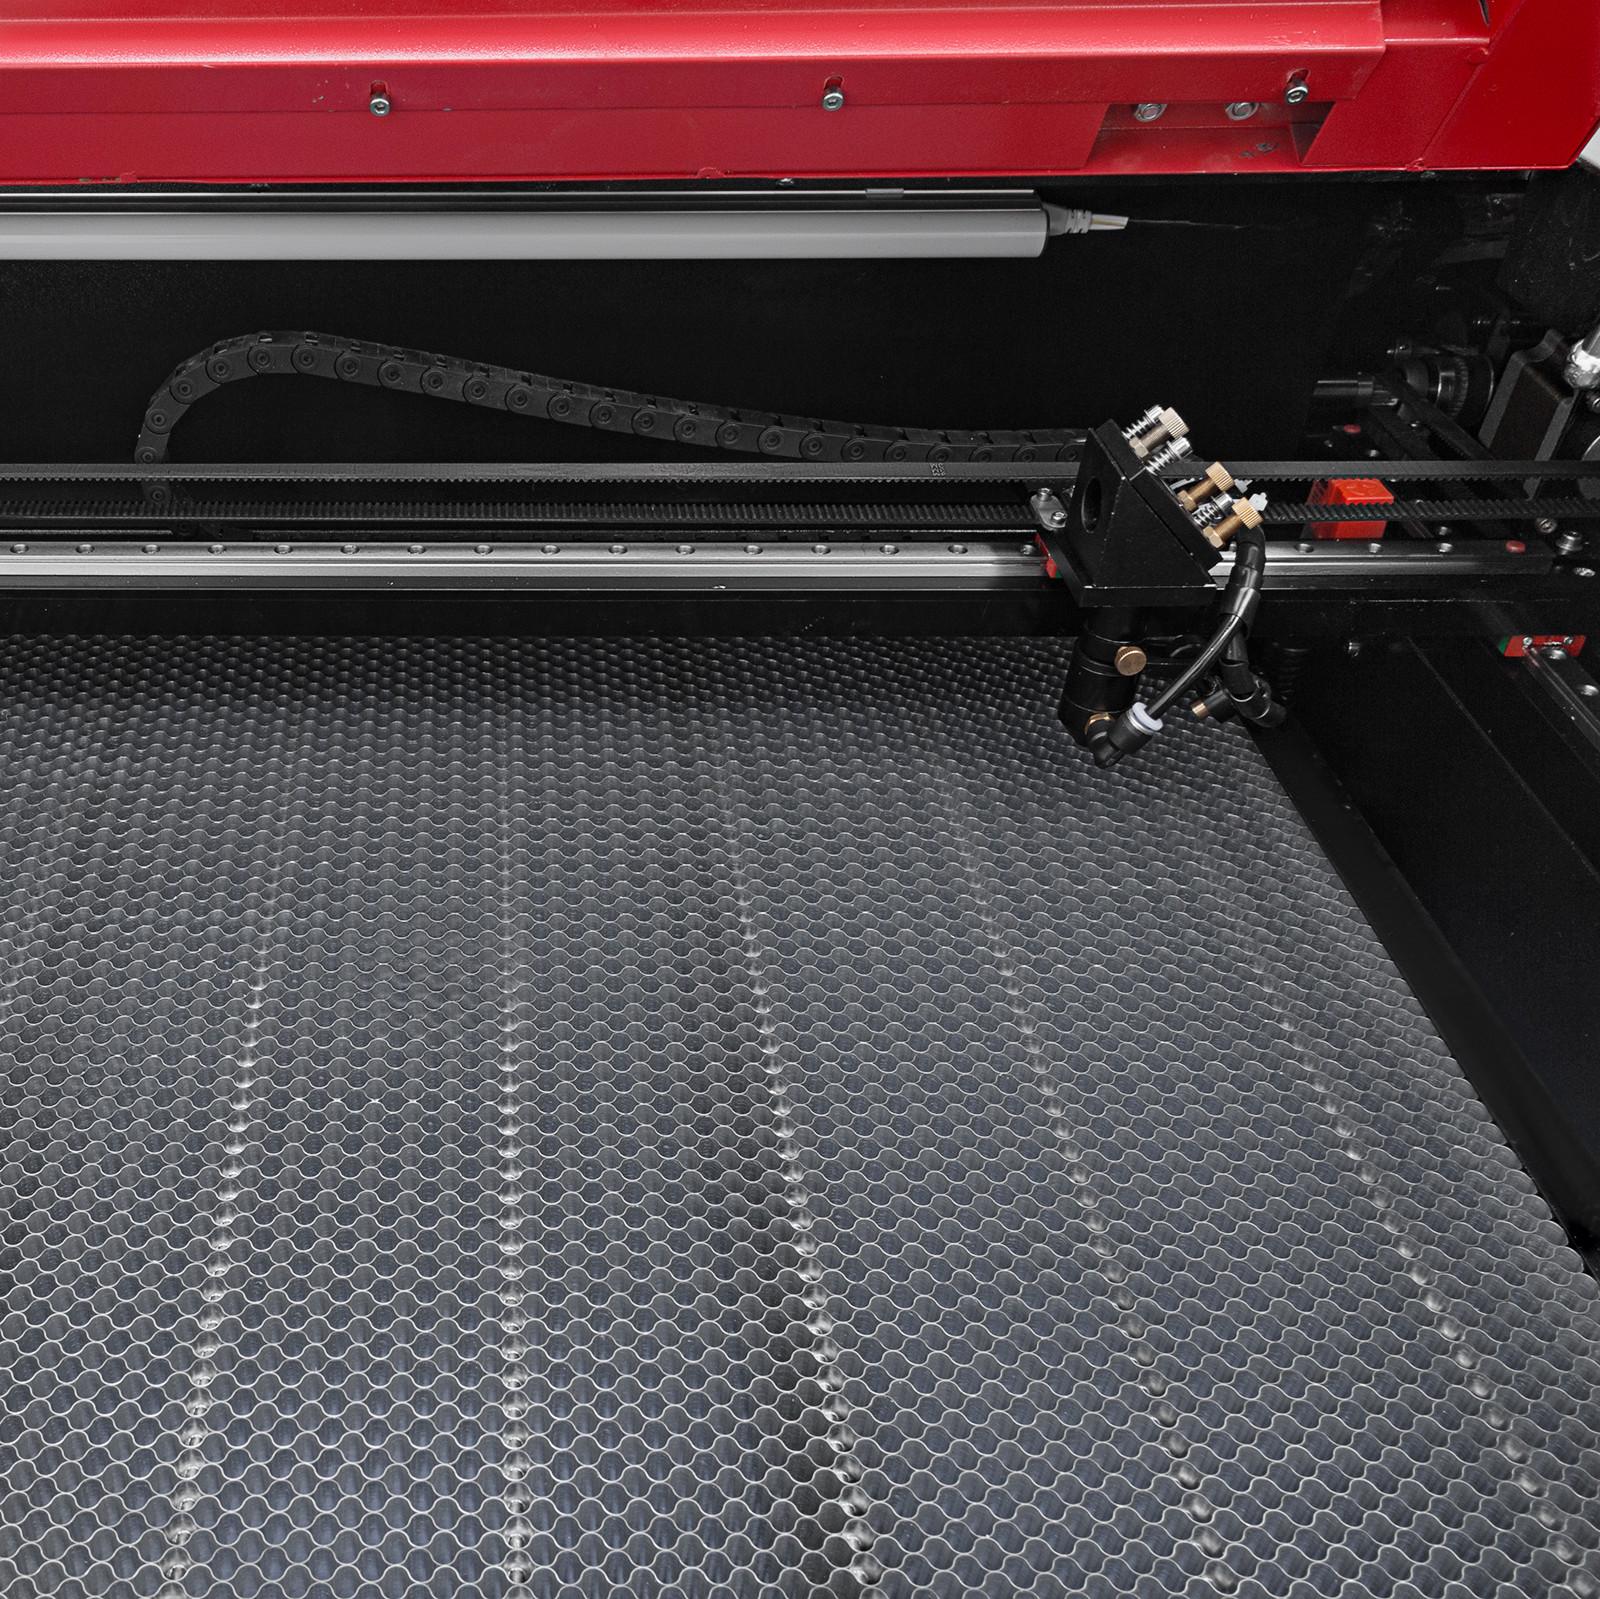 Macchina-per-Incisione-Laser-CO2-40-130W-Asse-Rotante-Tagliatrice-Incisore miniatura 56